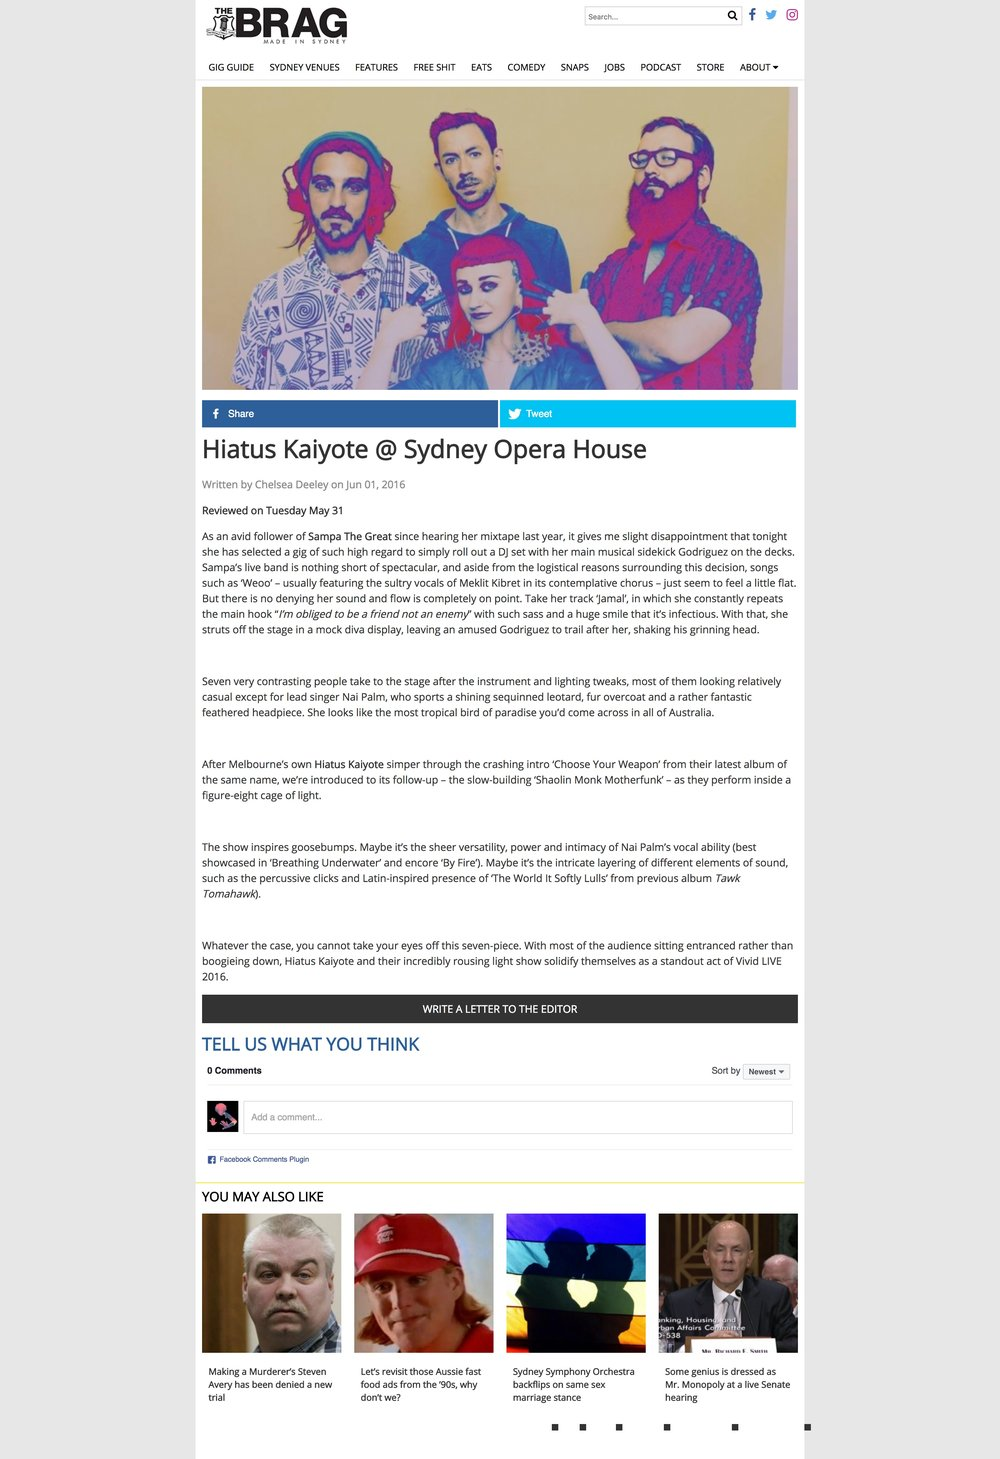 Hiatus Kaiyote @ Sydney Opera House